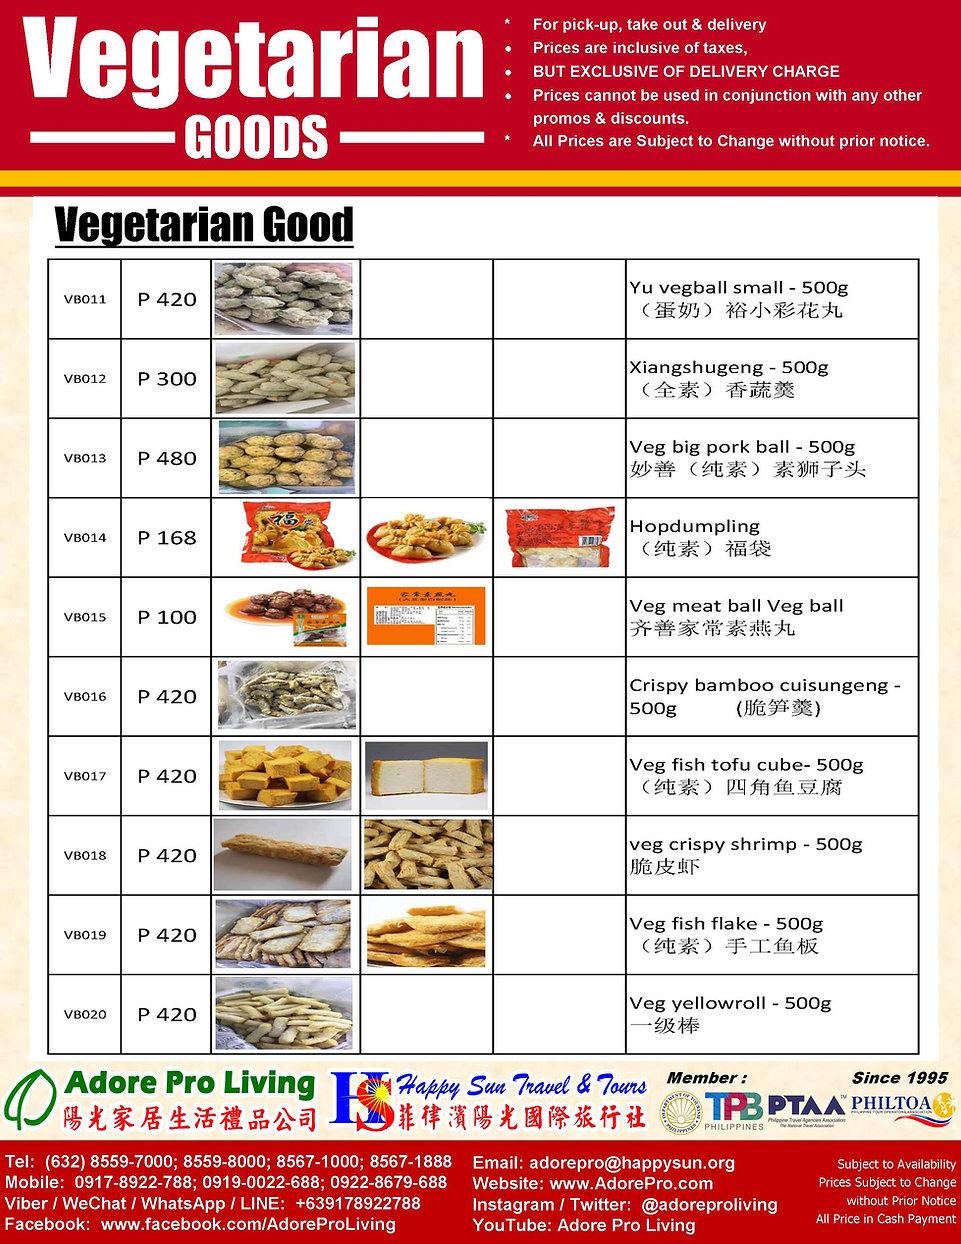 P5_Vegetarian Goods_20200929.jpg